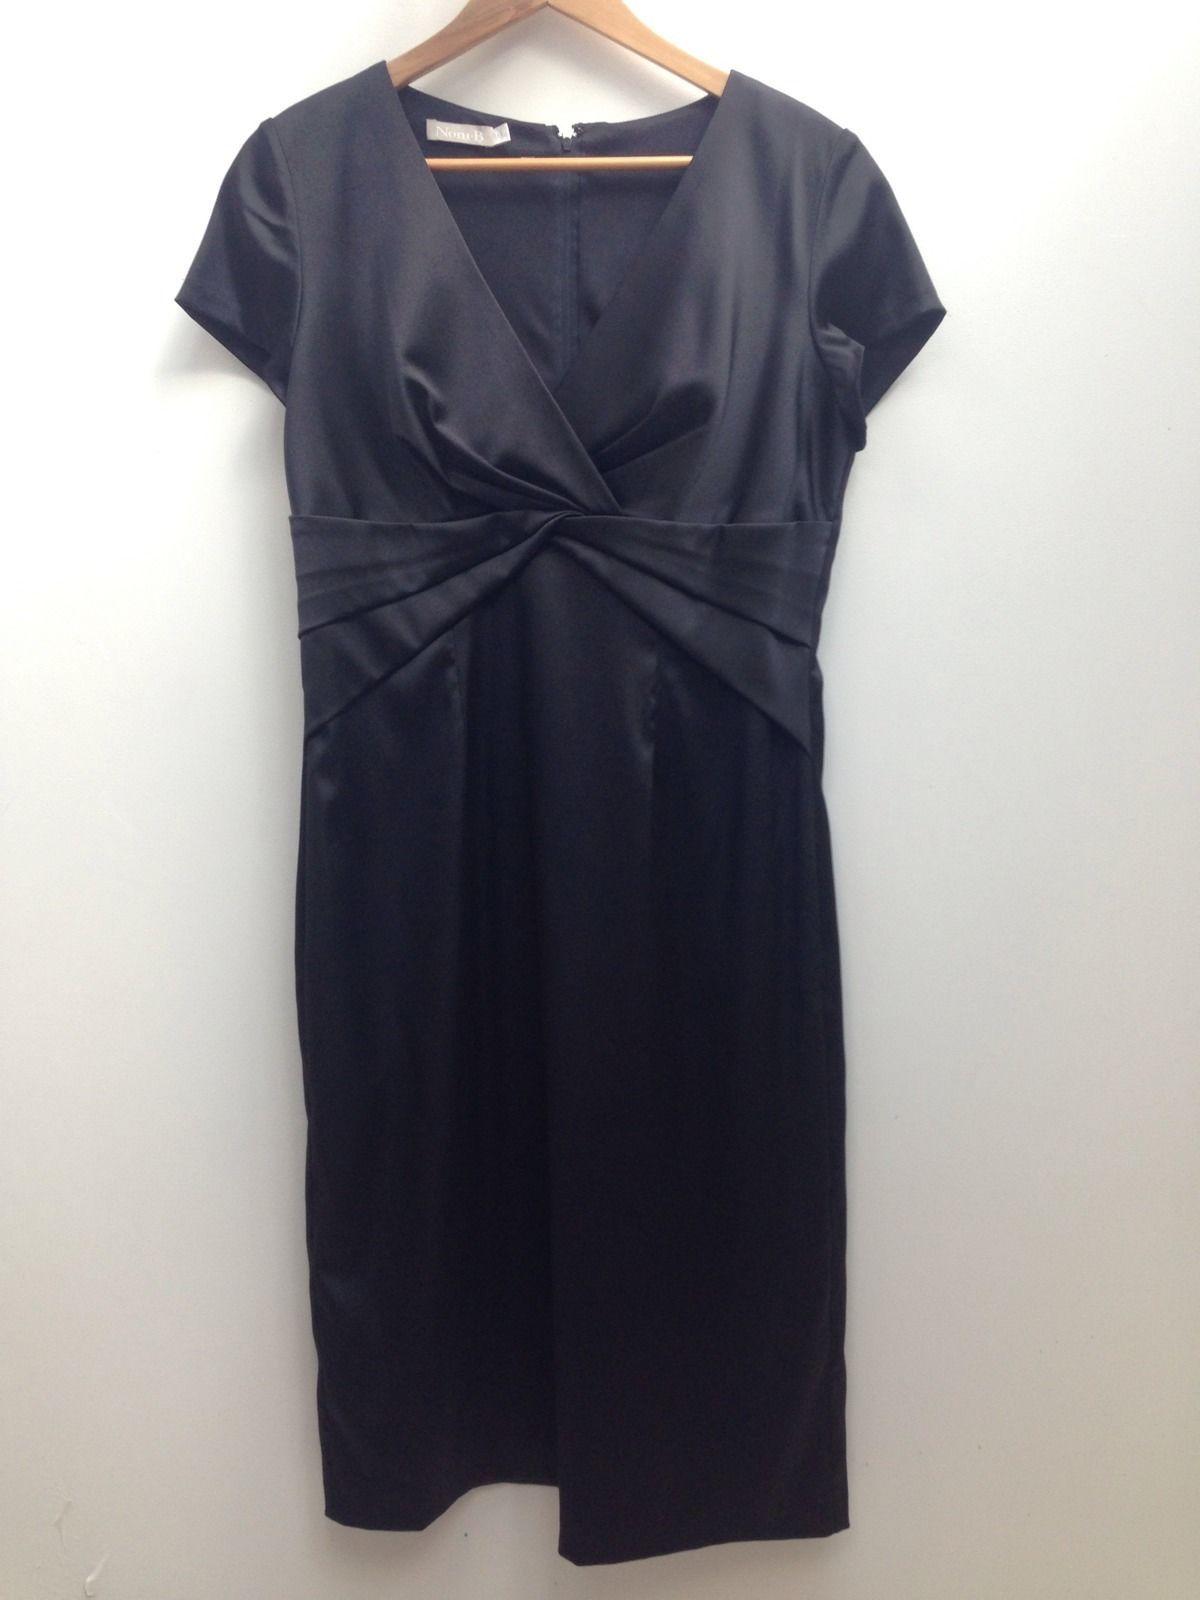 Noni b black dress 2t